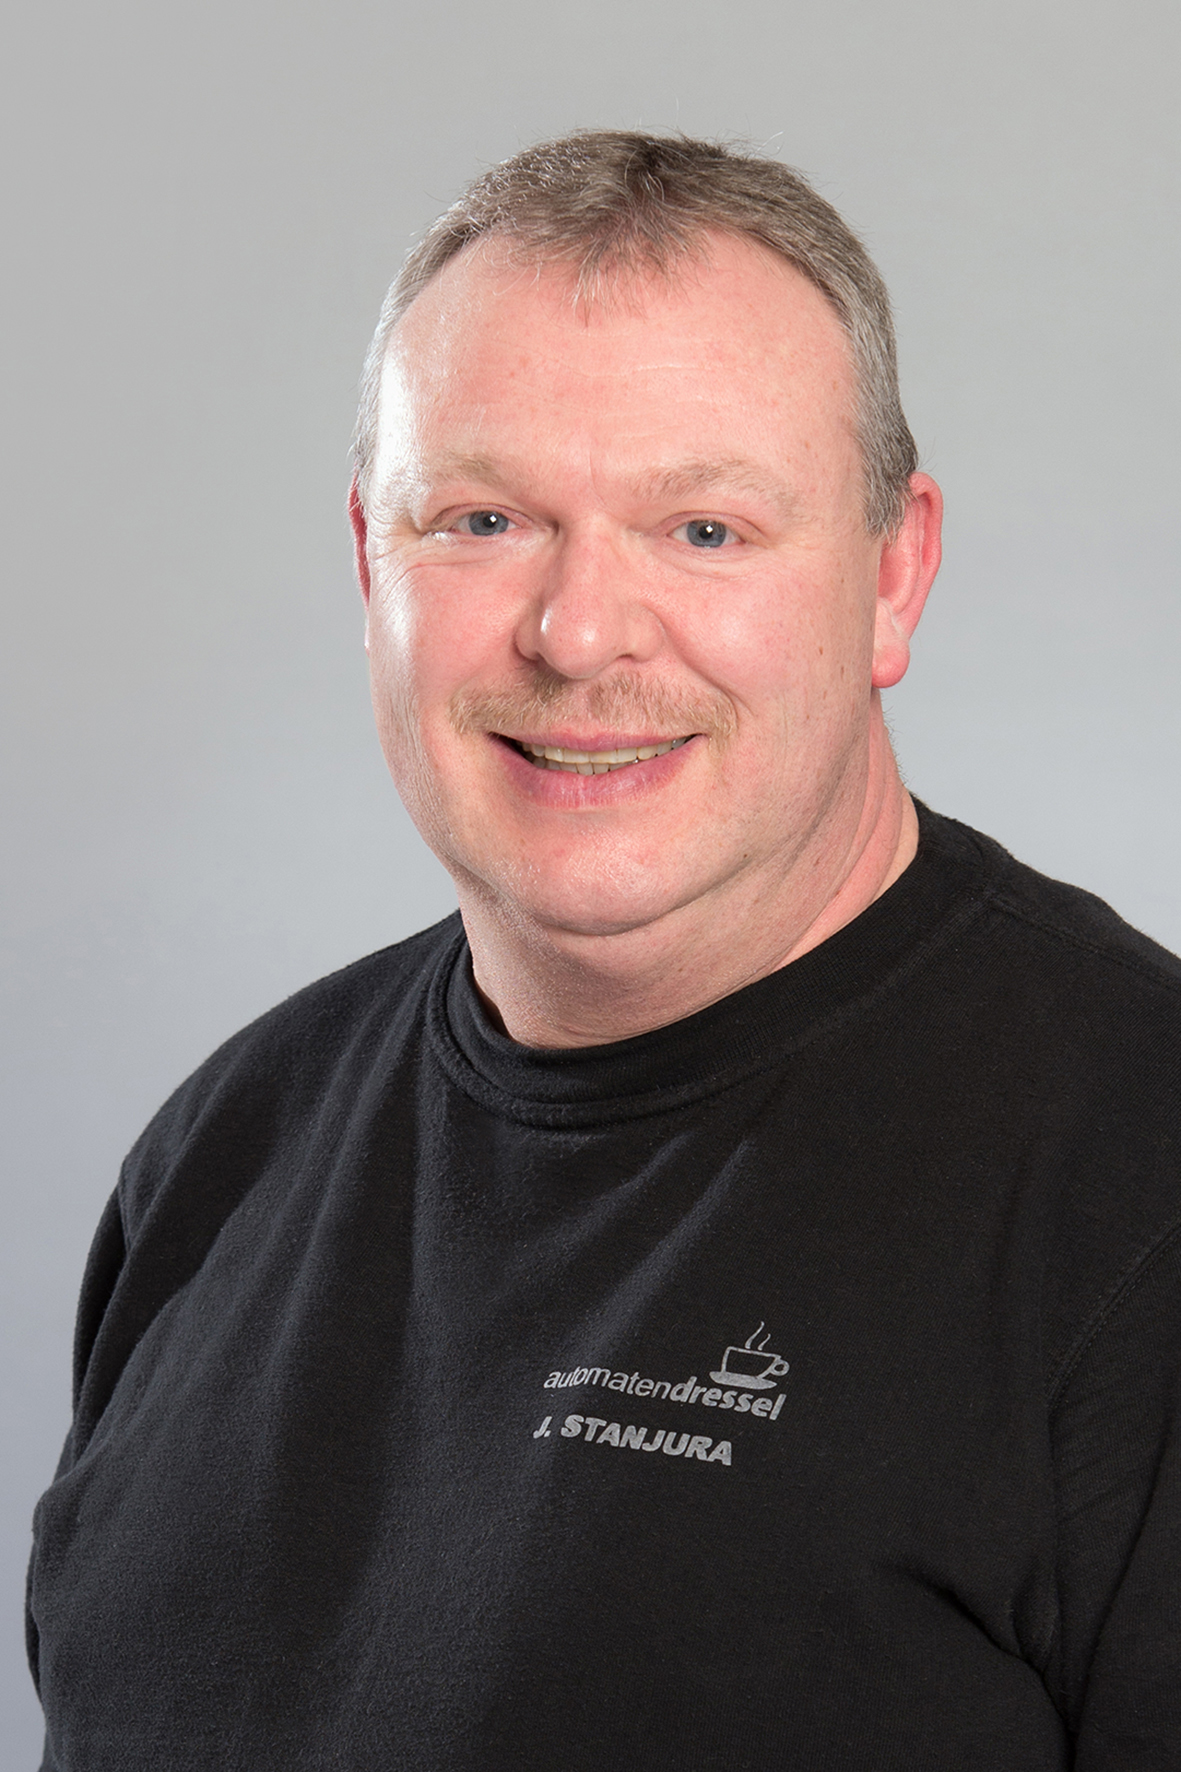 J. Stanjura  Automaten-Servicetechniker